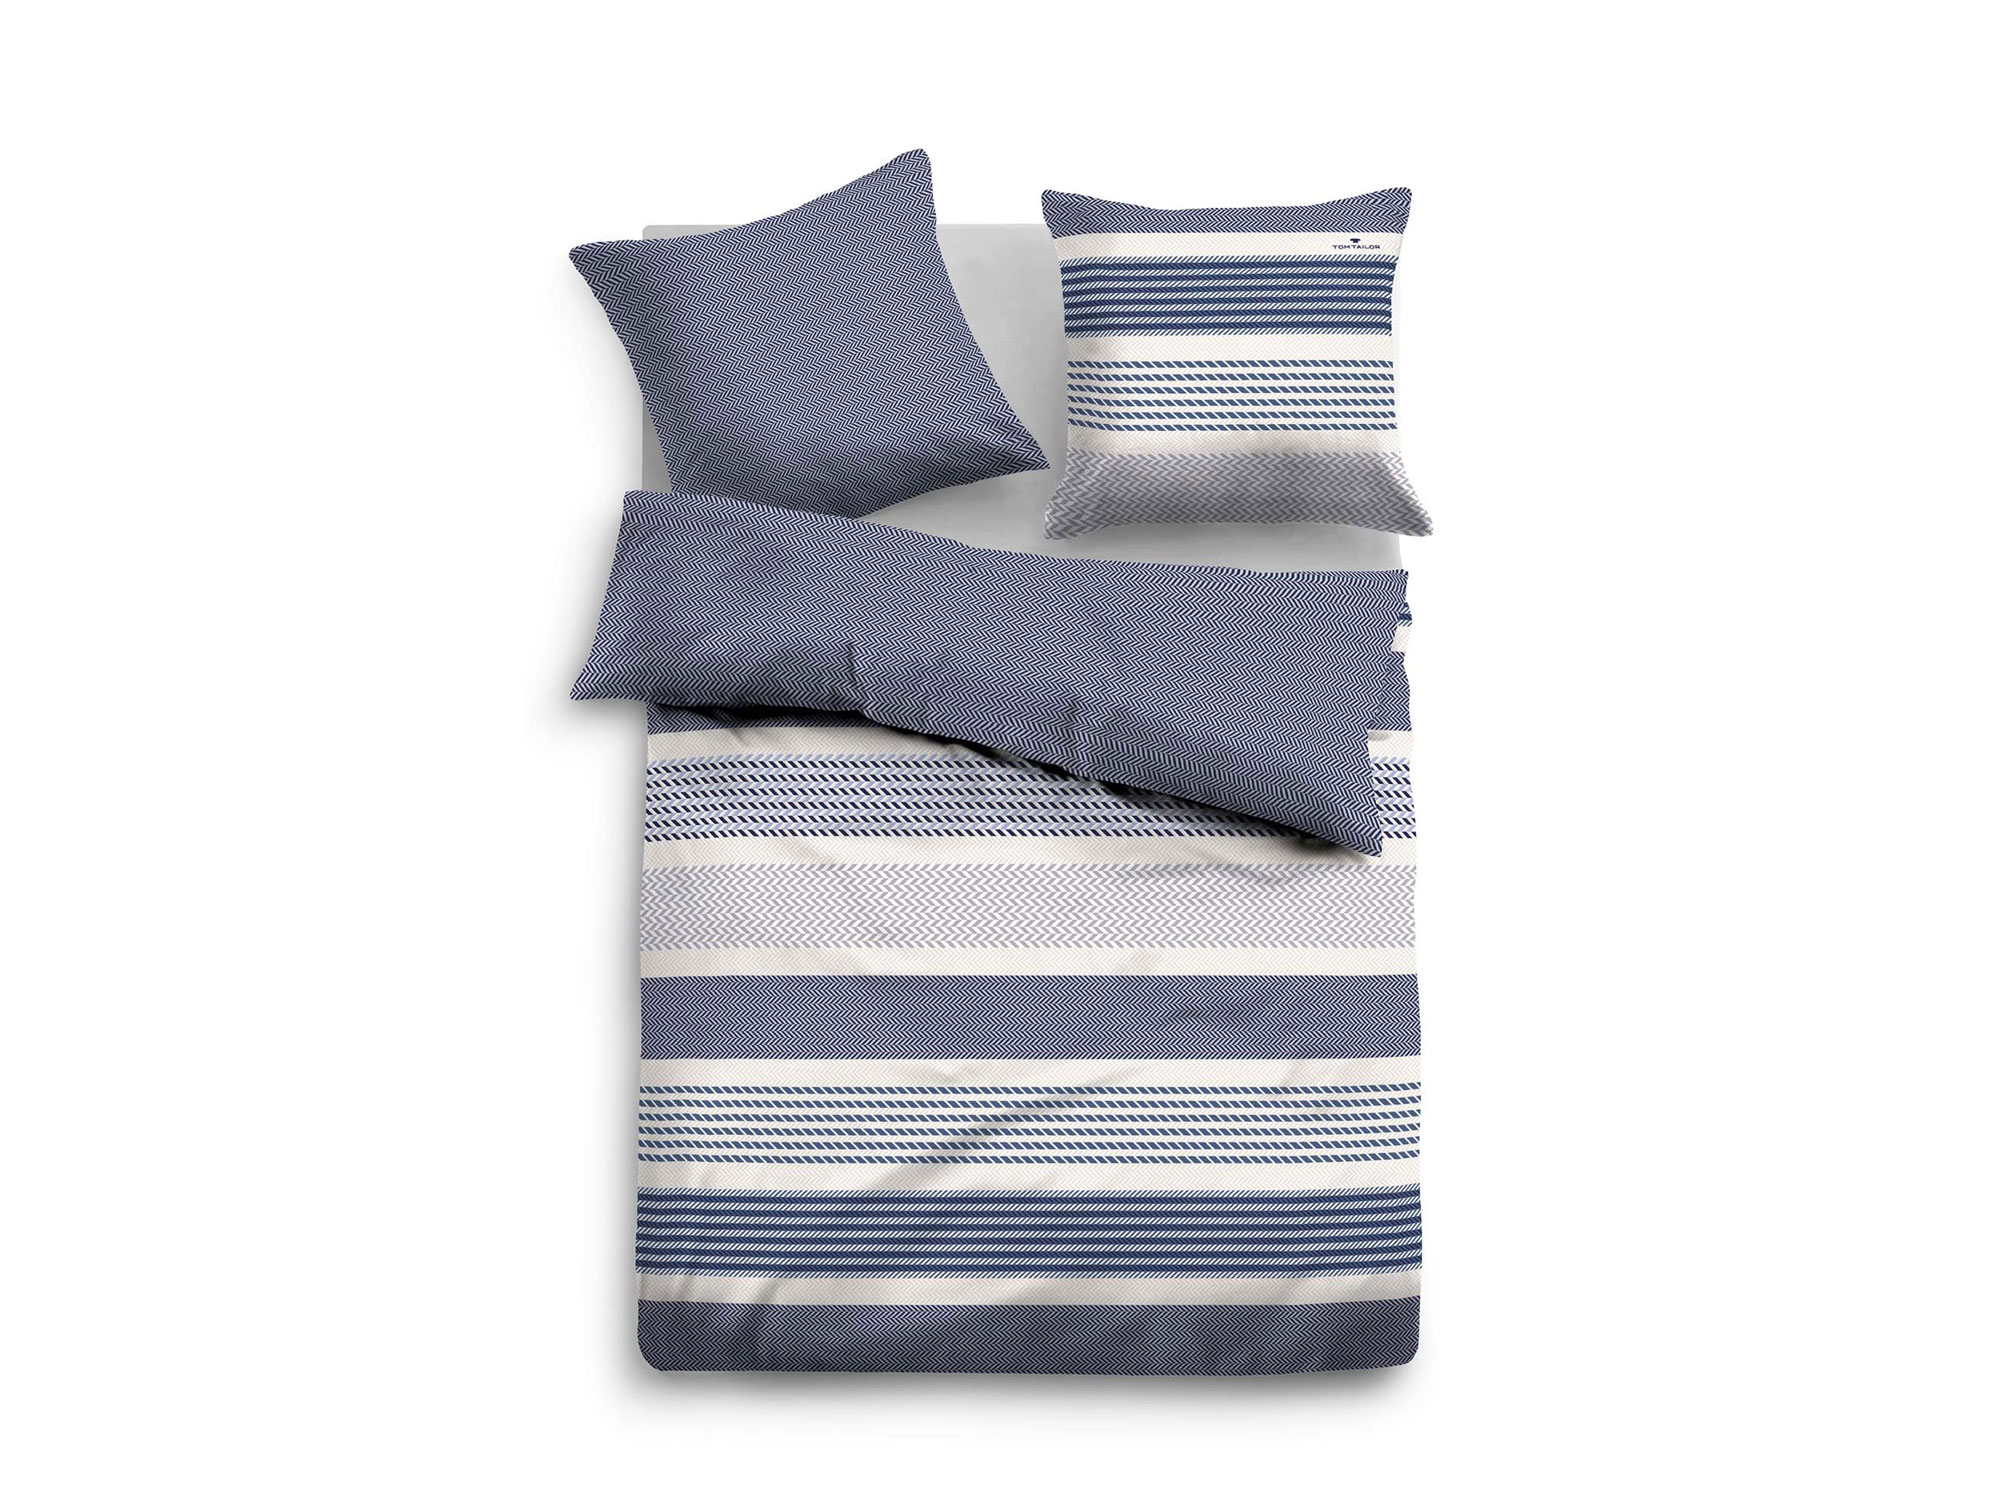 tom tailor bettwaesche satin bed linen xx cm